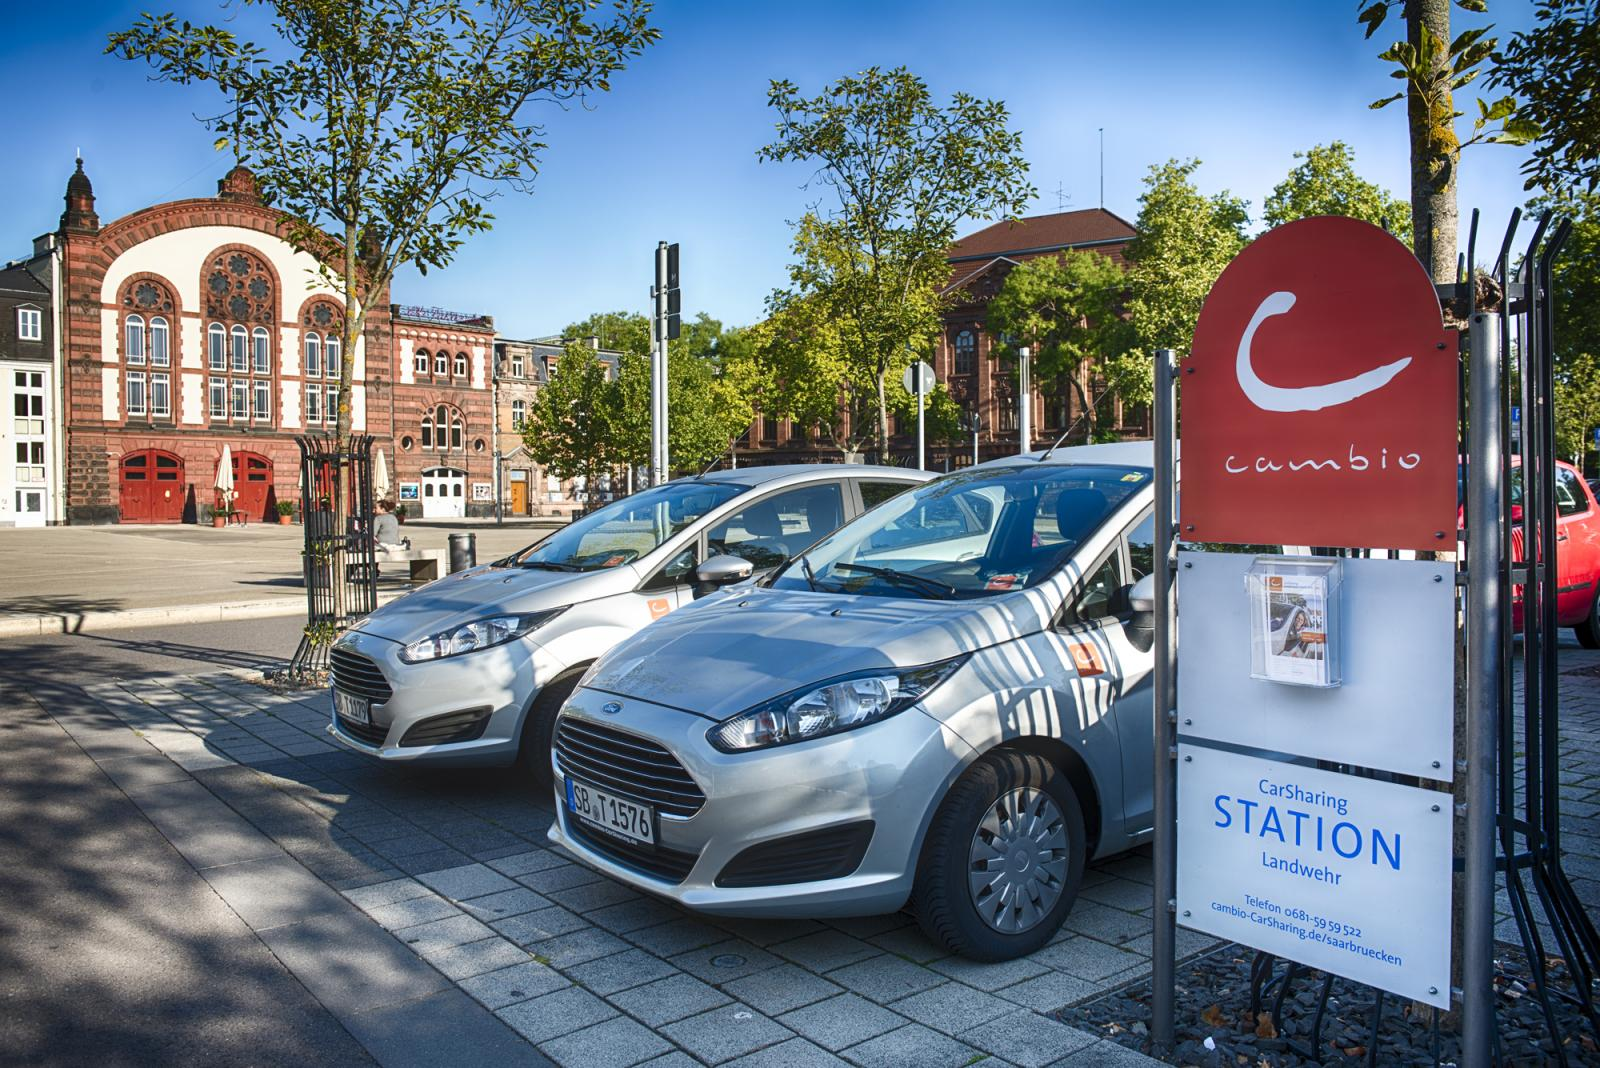 CarSharing-Station (Foto: cambio)